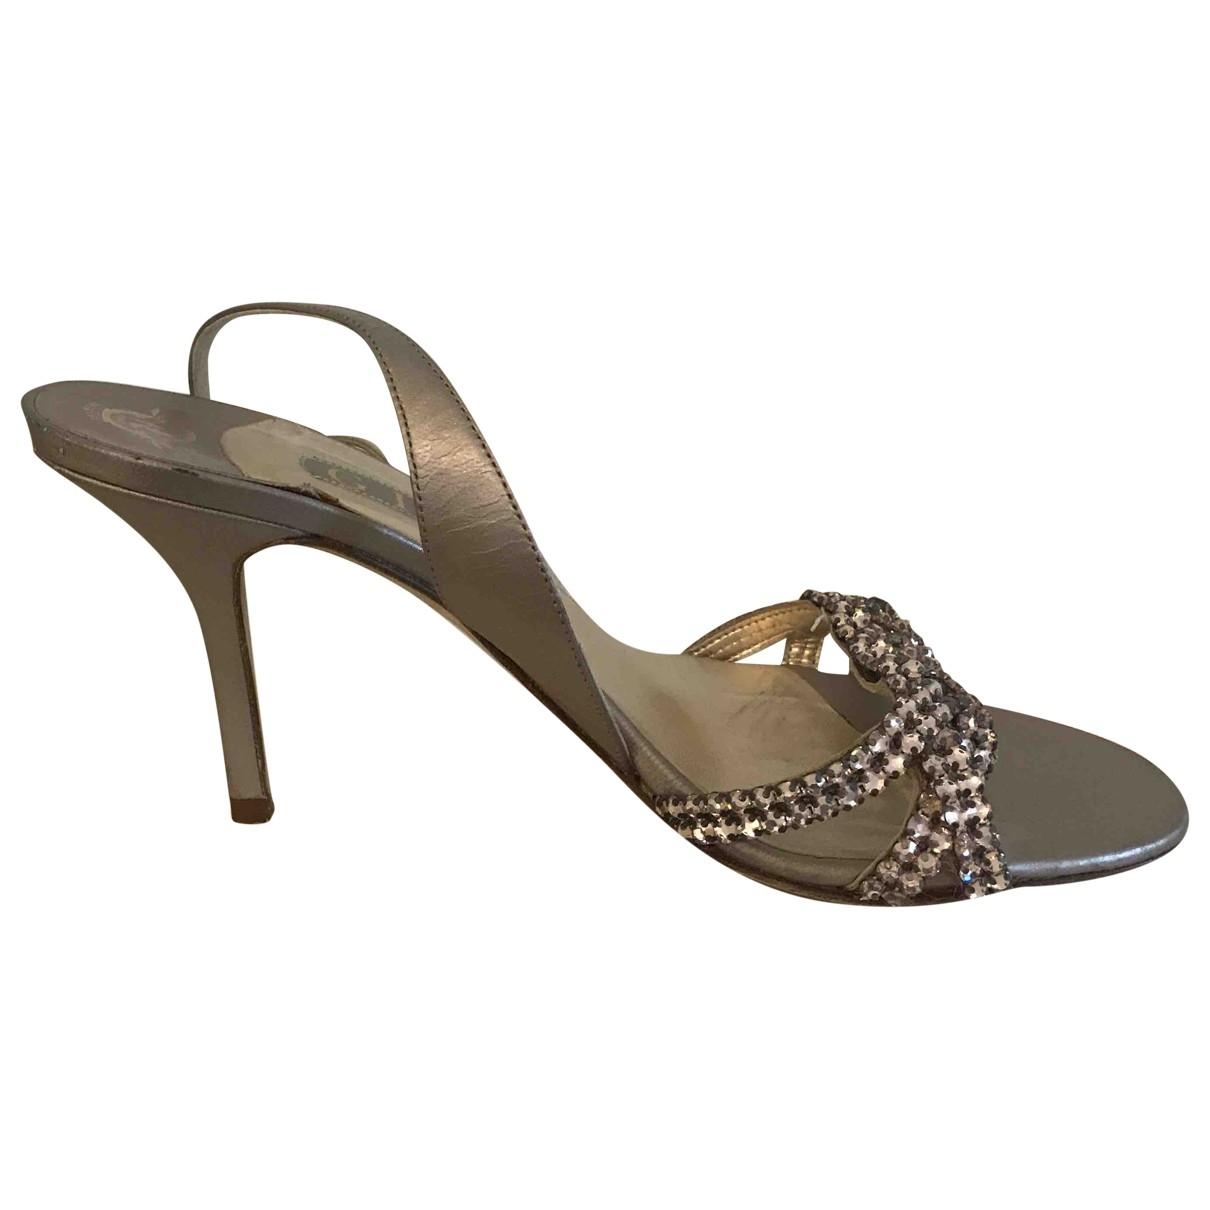 Gina \N Metallic Leather Sandals for Women 7 UK